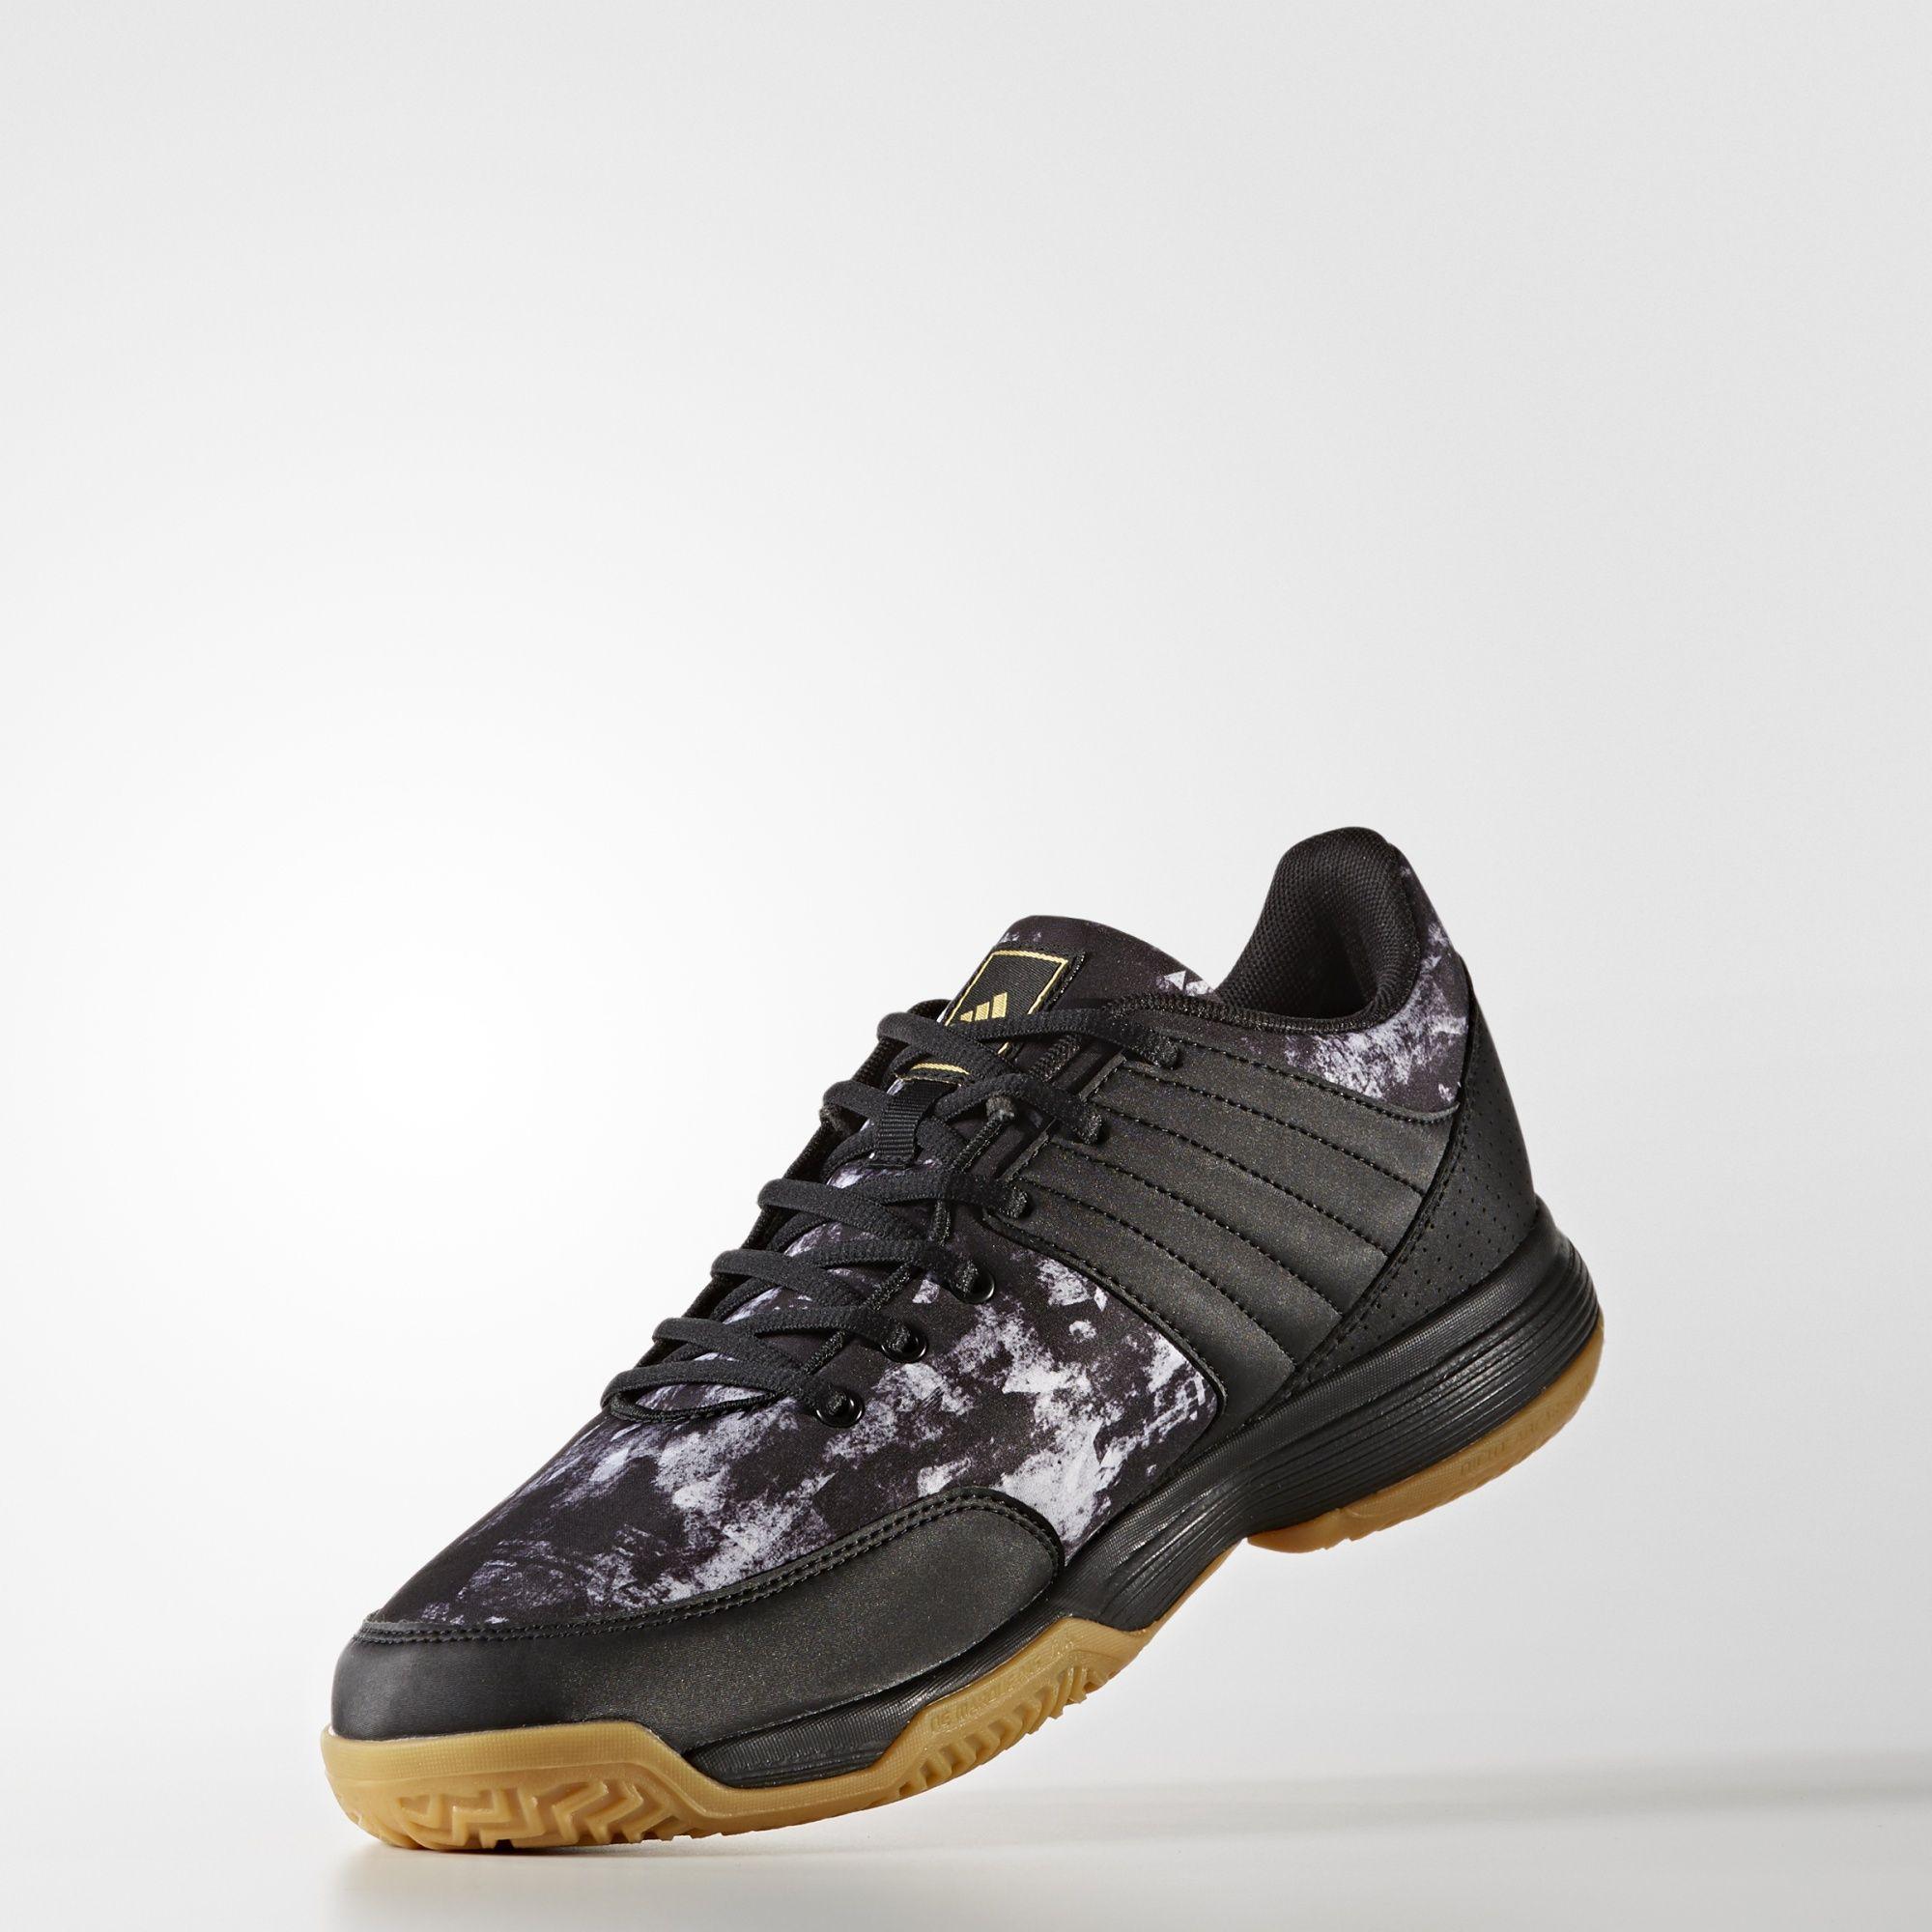 Paire de chaussures de volley-ball homme adidas Ligra 5